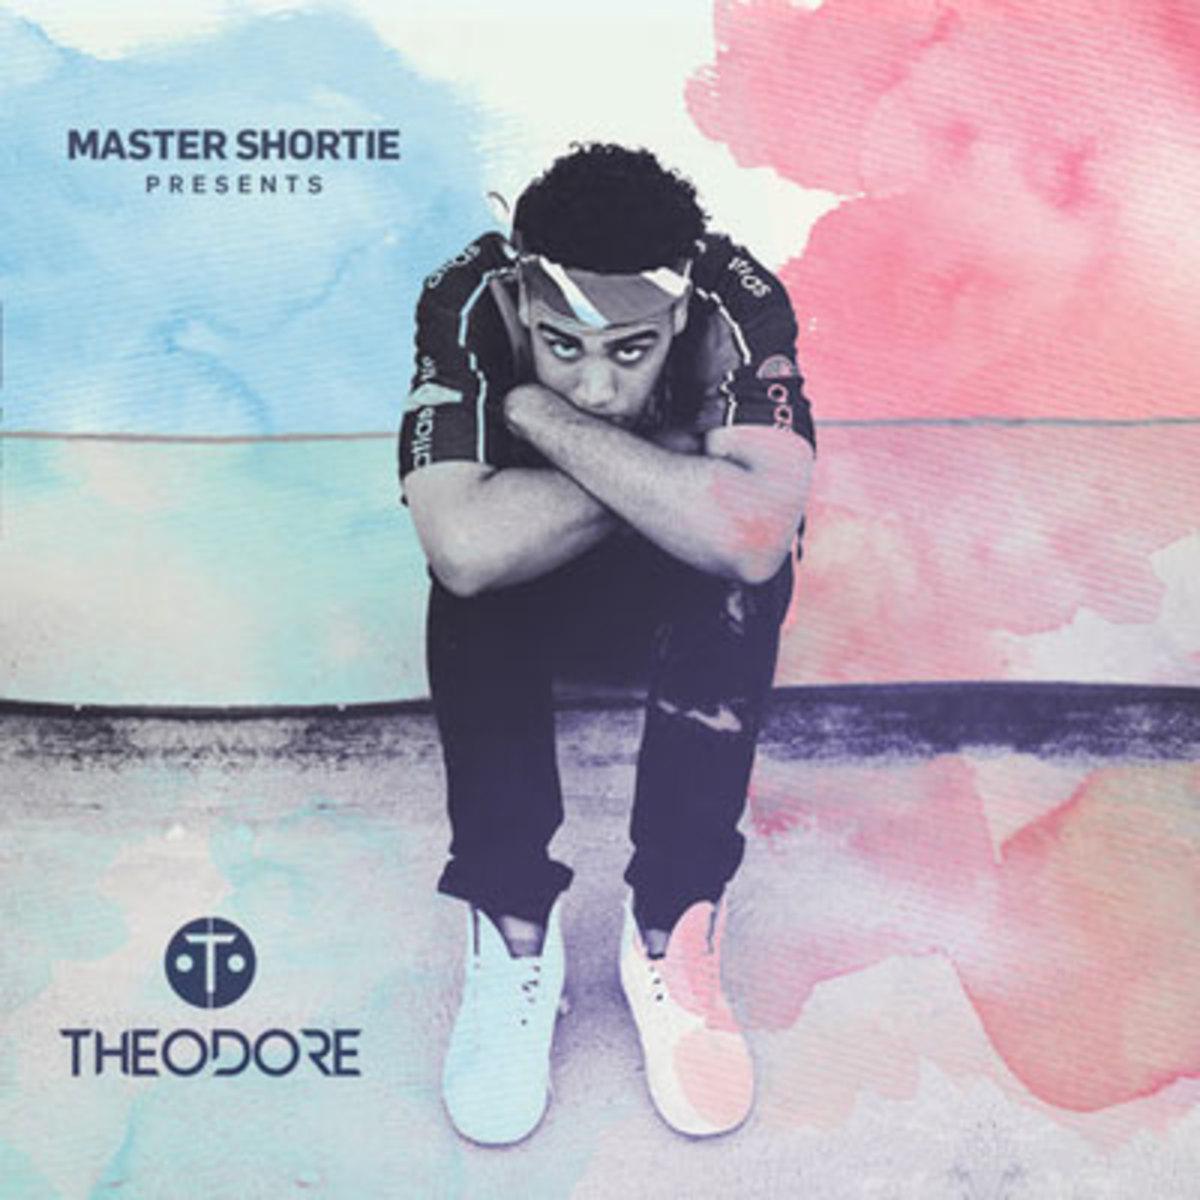 mastershortie-theodore.jpg